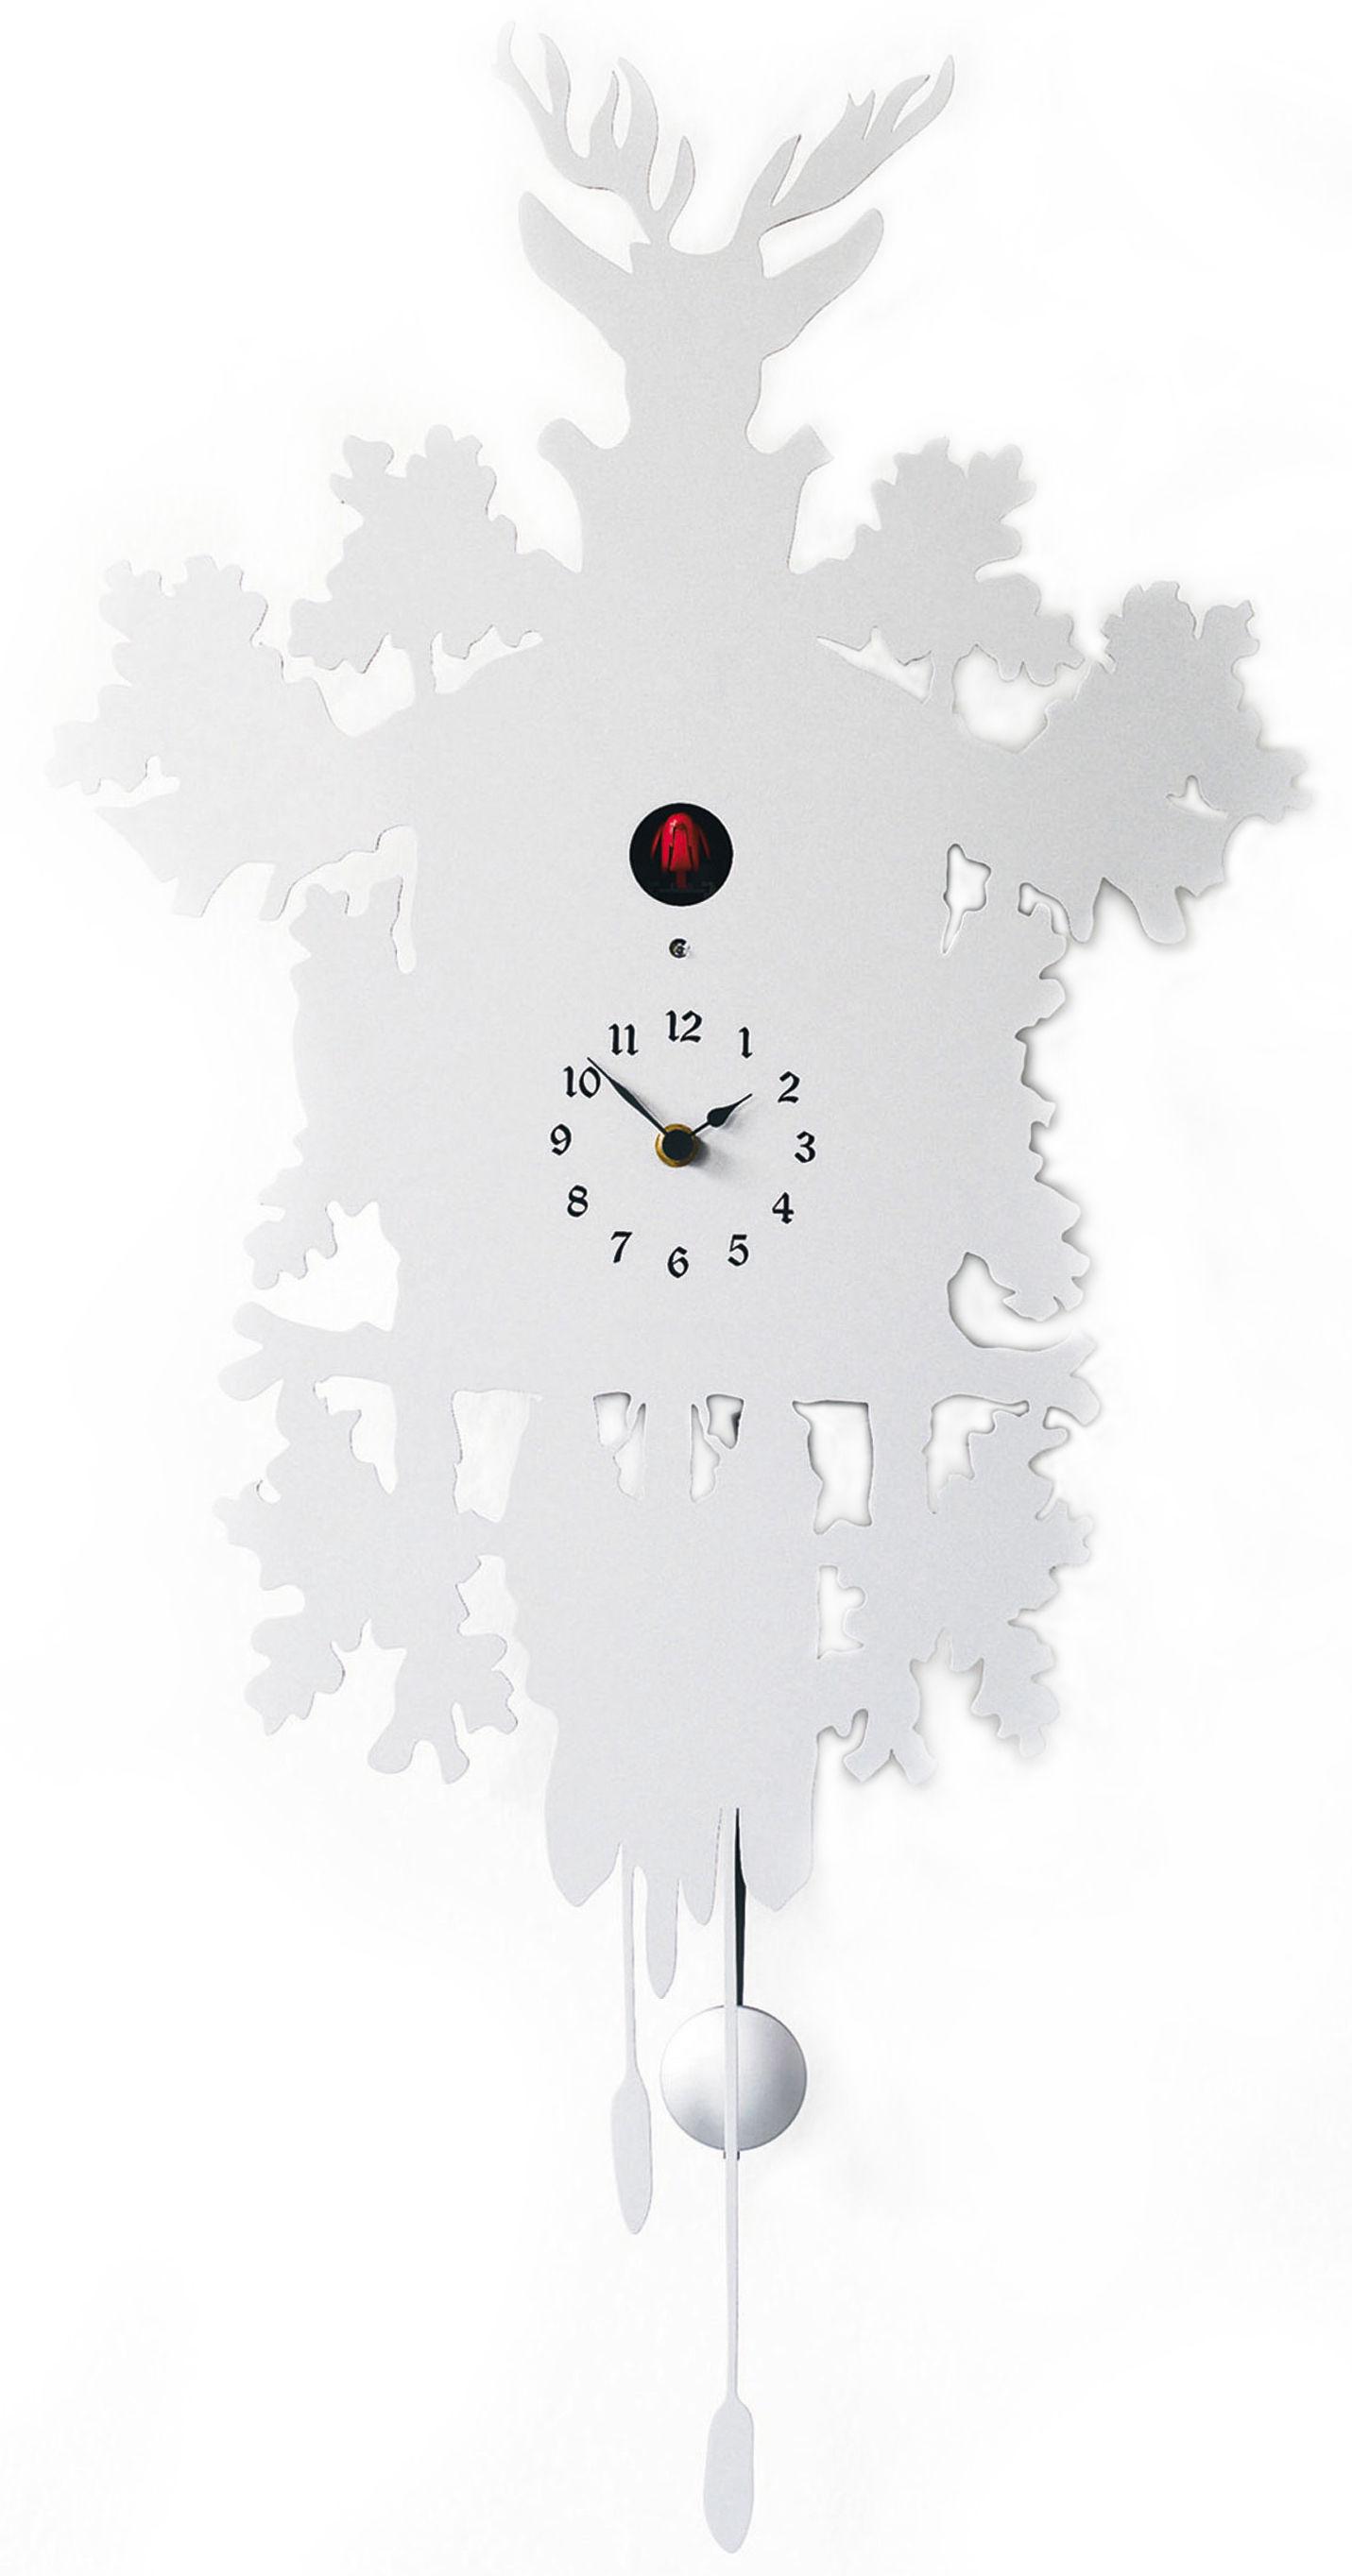 Déco - Horloges  - Horloge murale Cucù / Avec balancier - H 81 cm - Diamantini & Domeniconi - Blanc - Acier inoxydable laqué